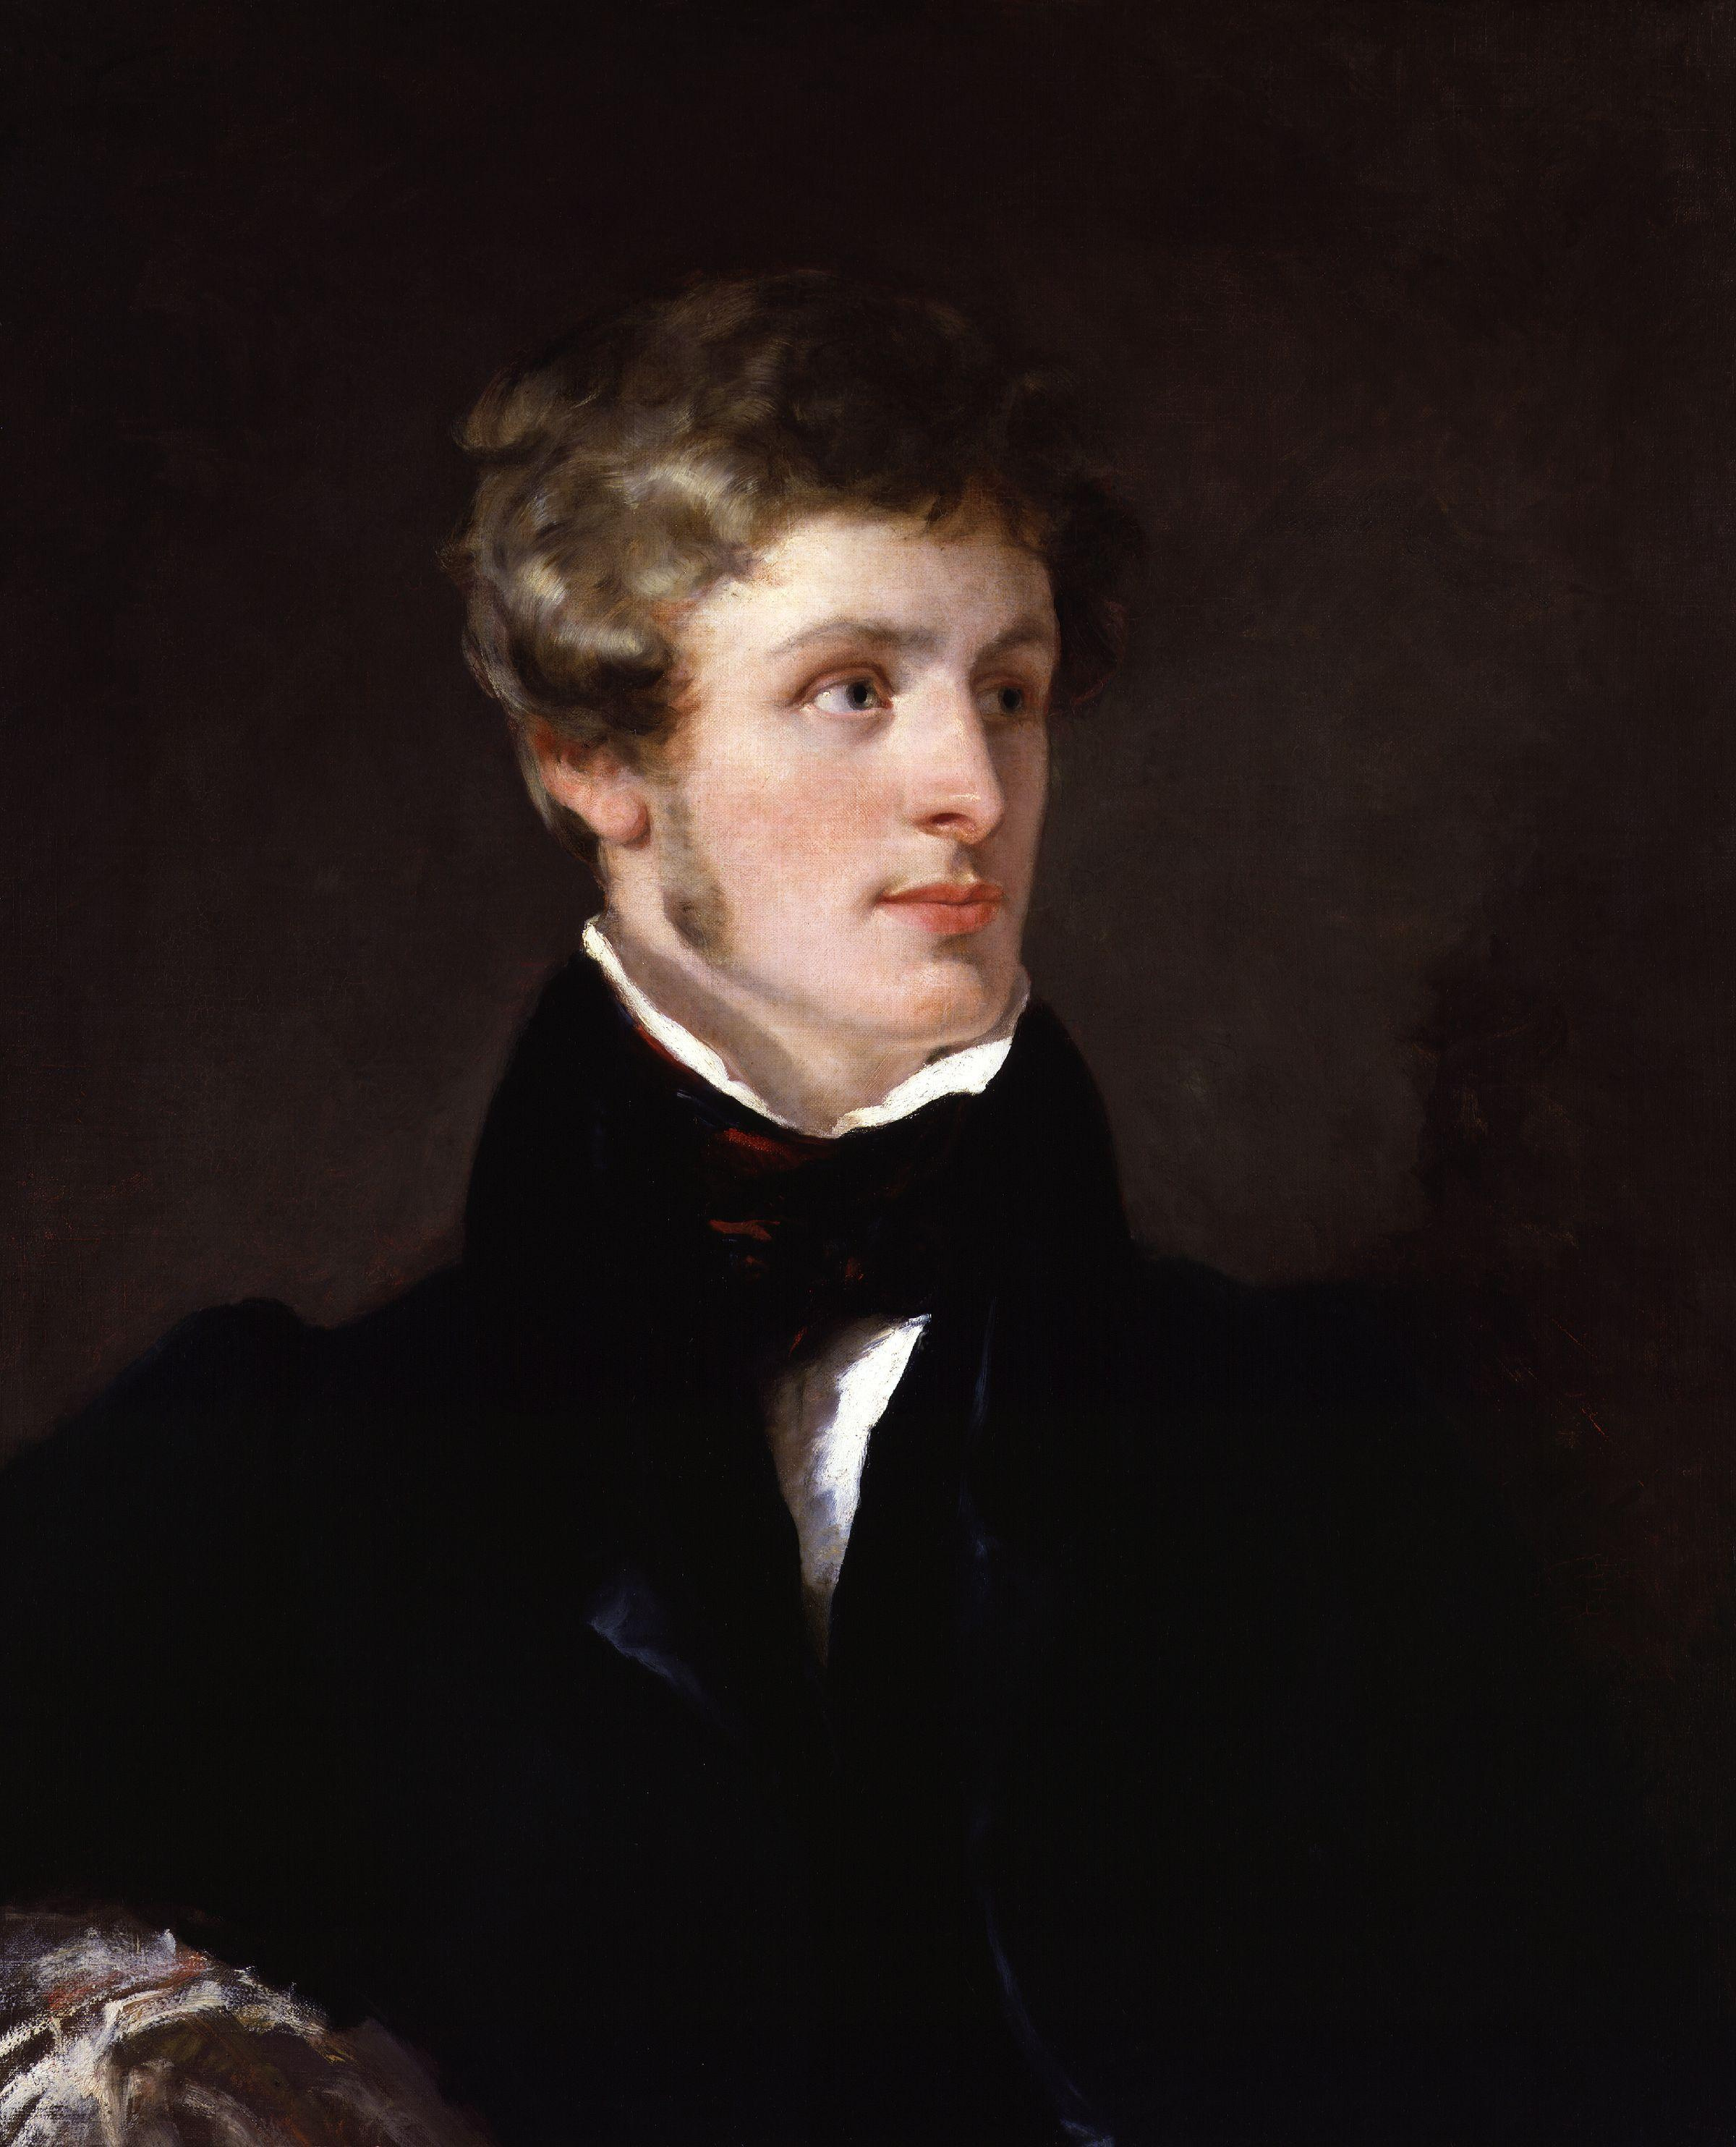 Image of David Octavius Hill from Wikidata